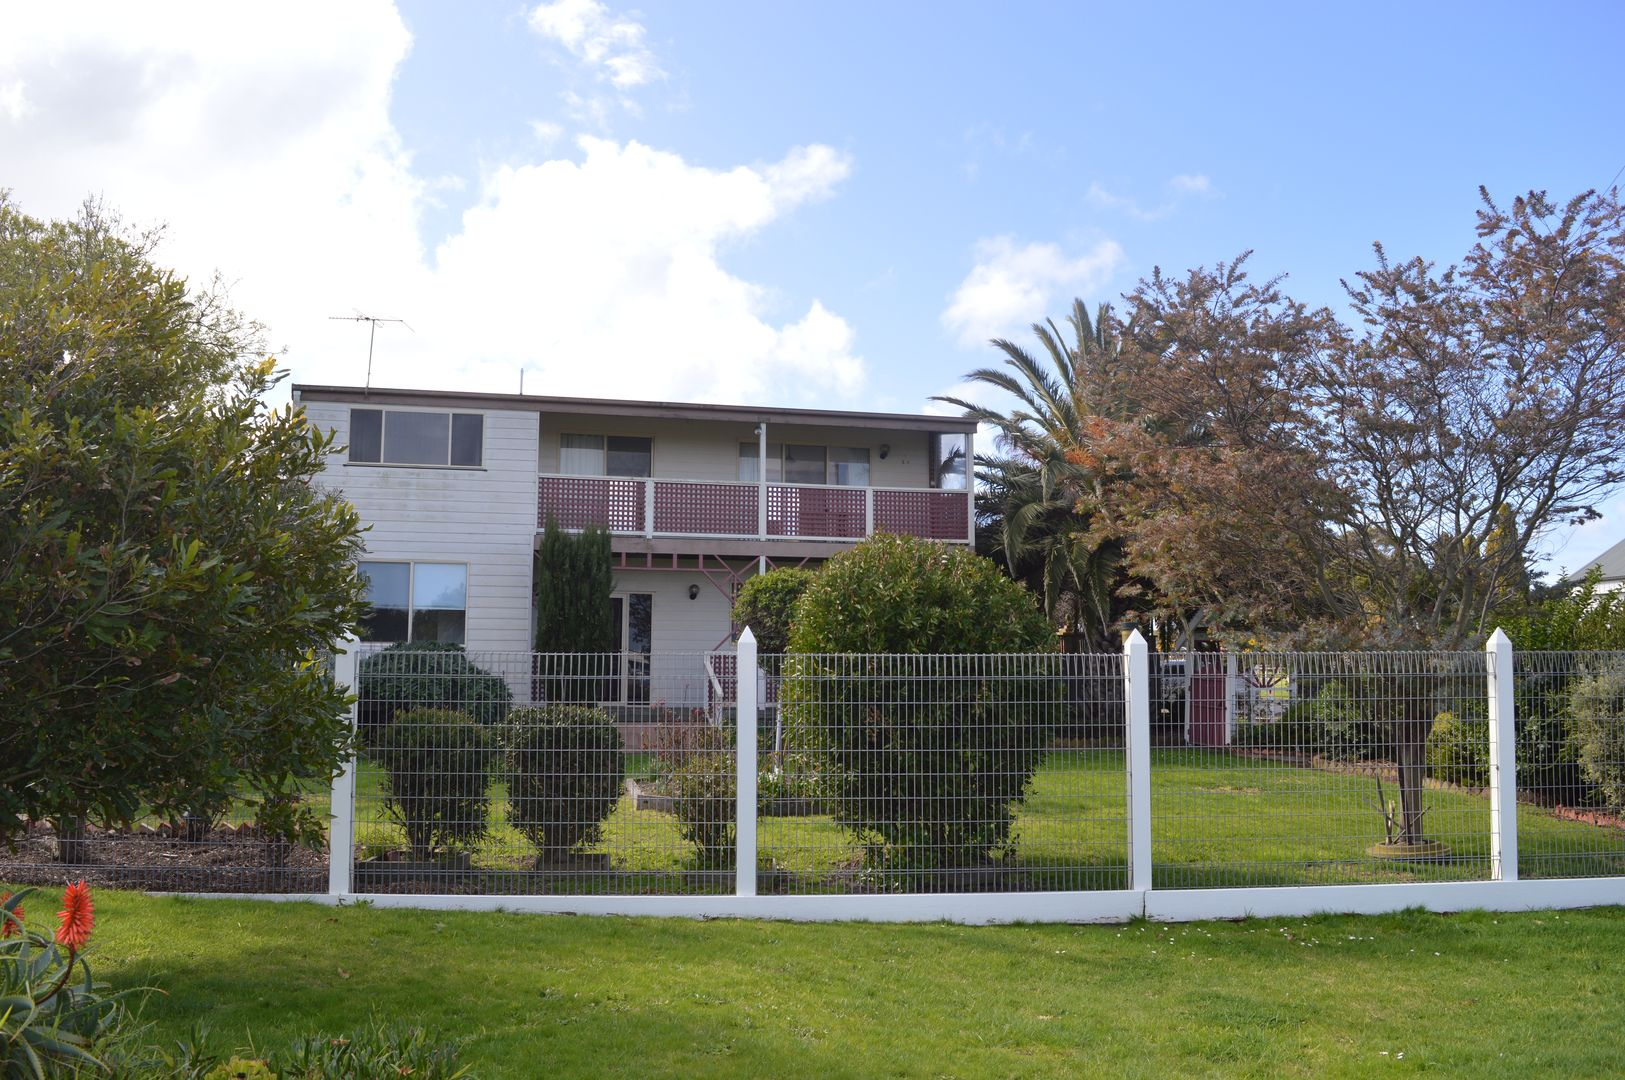 74 McLoughlins Road, Mcloughlins Beach VIC 3874, Image 0